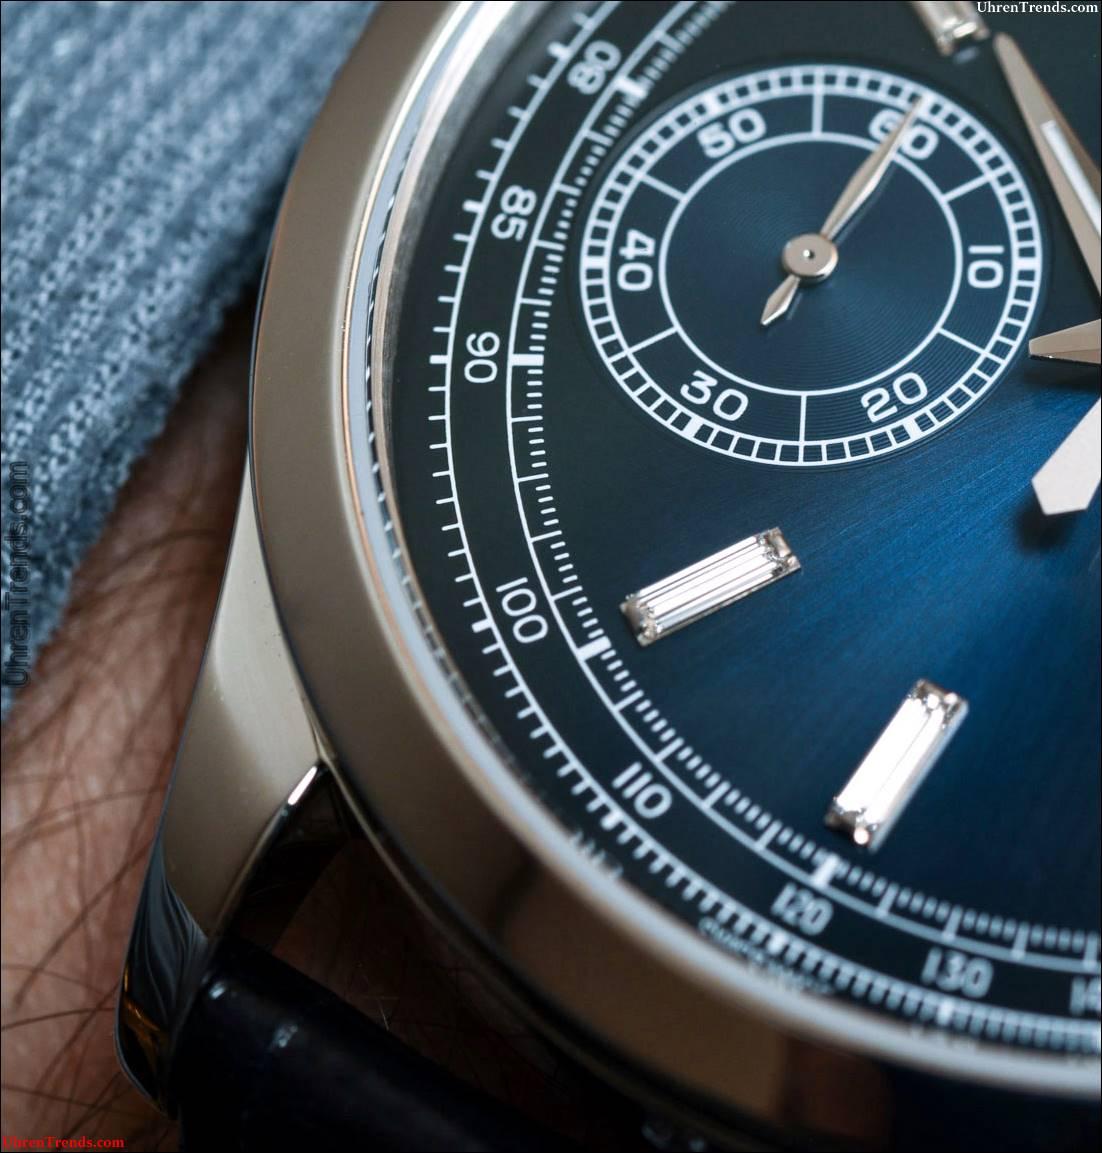 Patek Philippe 5170P-001 In Platin mit Diamanten Uhr Hands-On